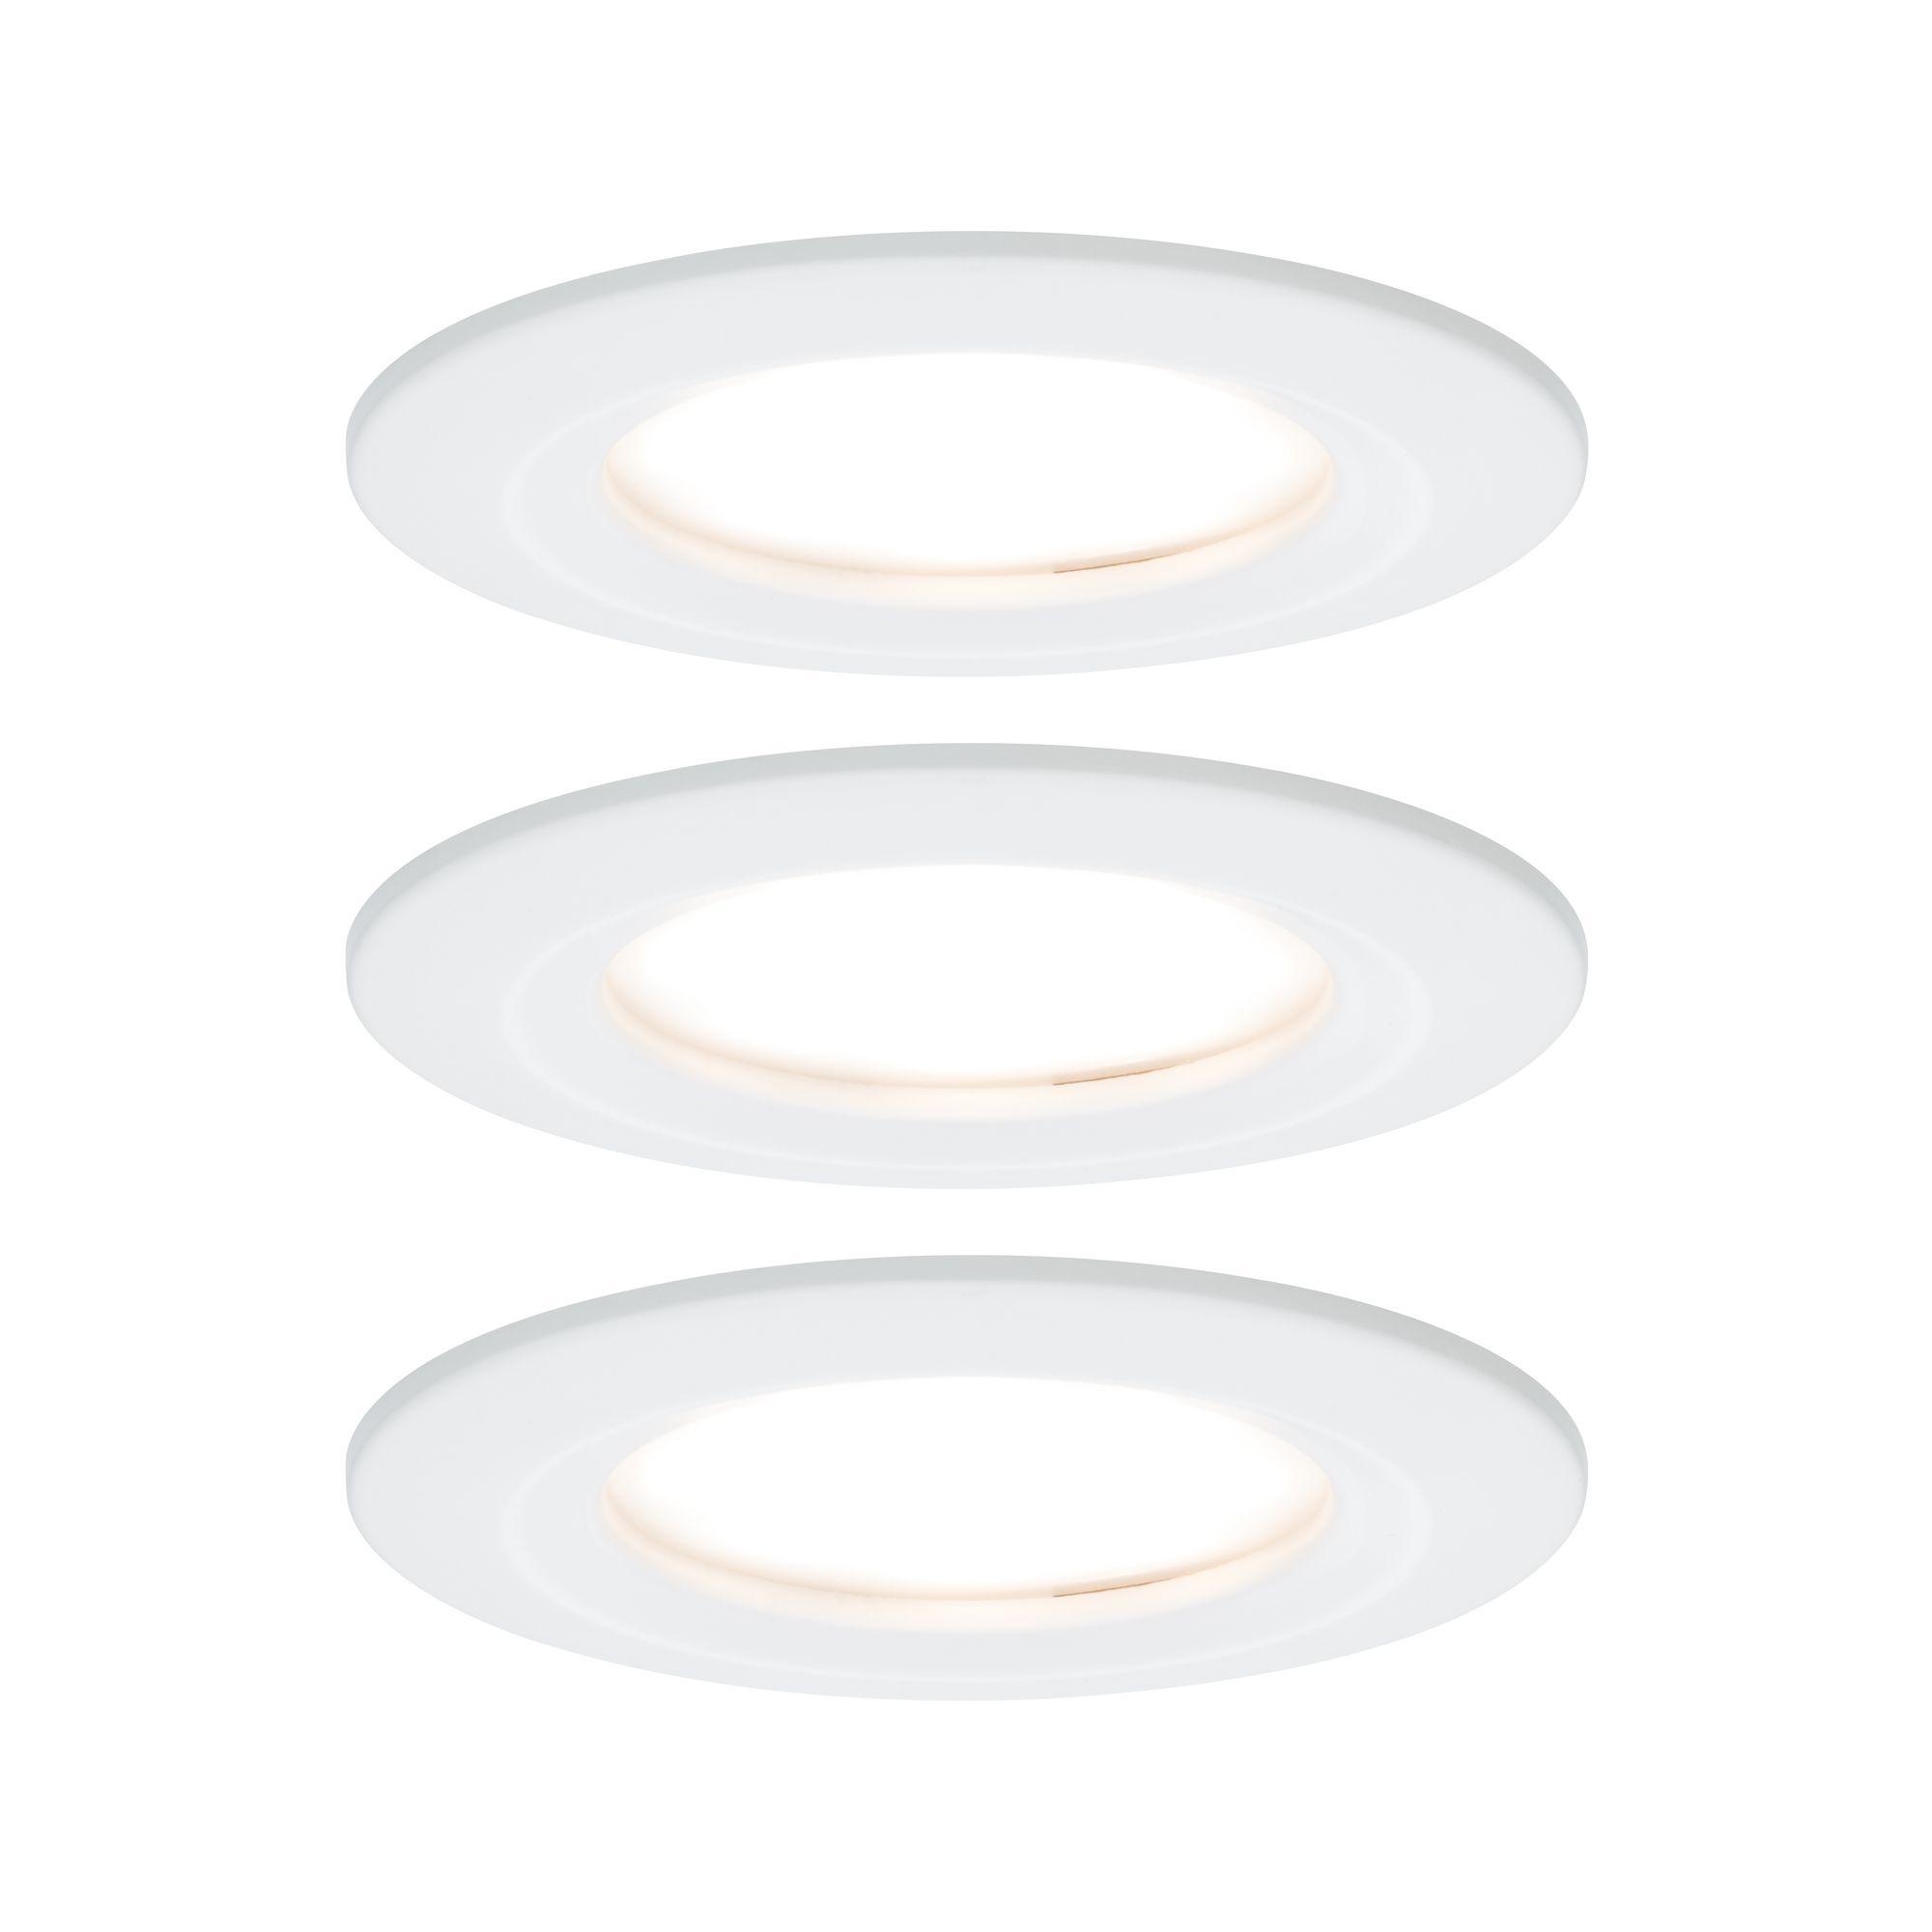 Paulmann EBL Set Nova Coin 3-stepdim rd starr LED3x6,5W 2700K 230V Weiß matt/Alu